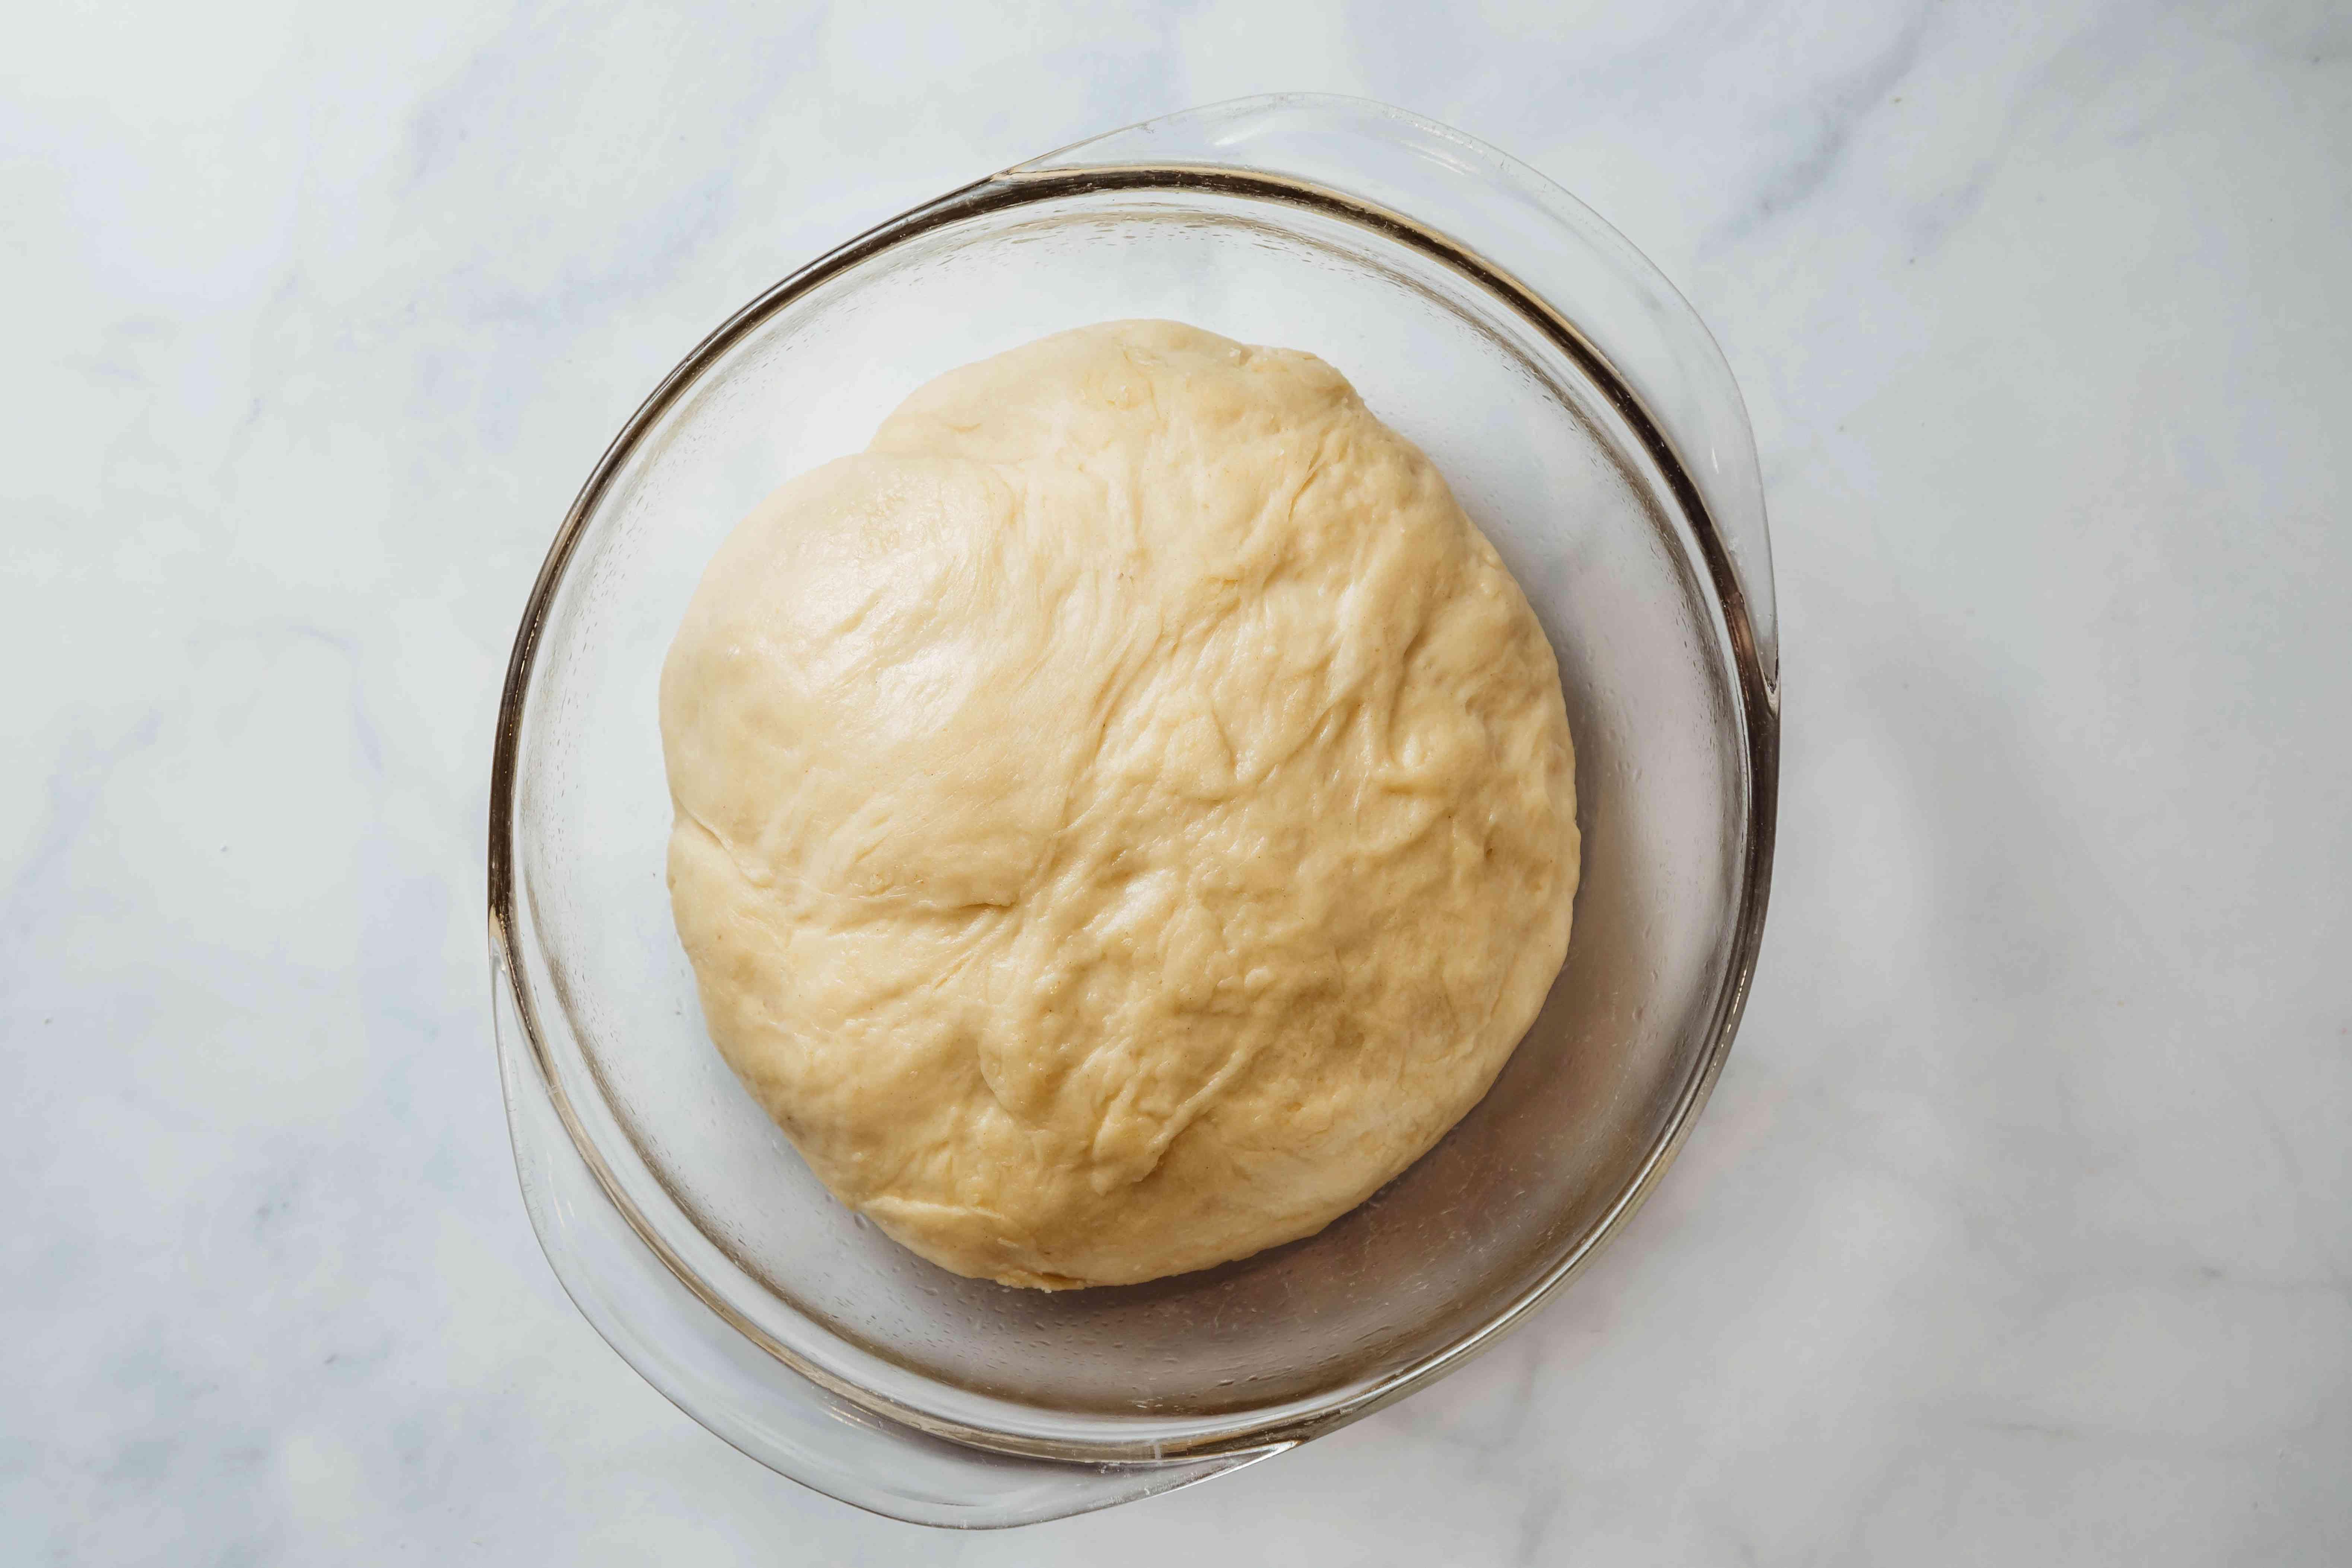 dough rising in a bowl